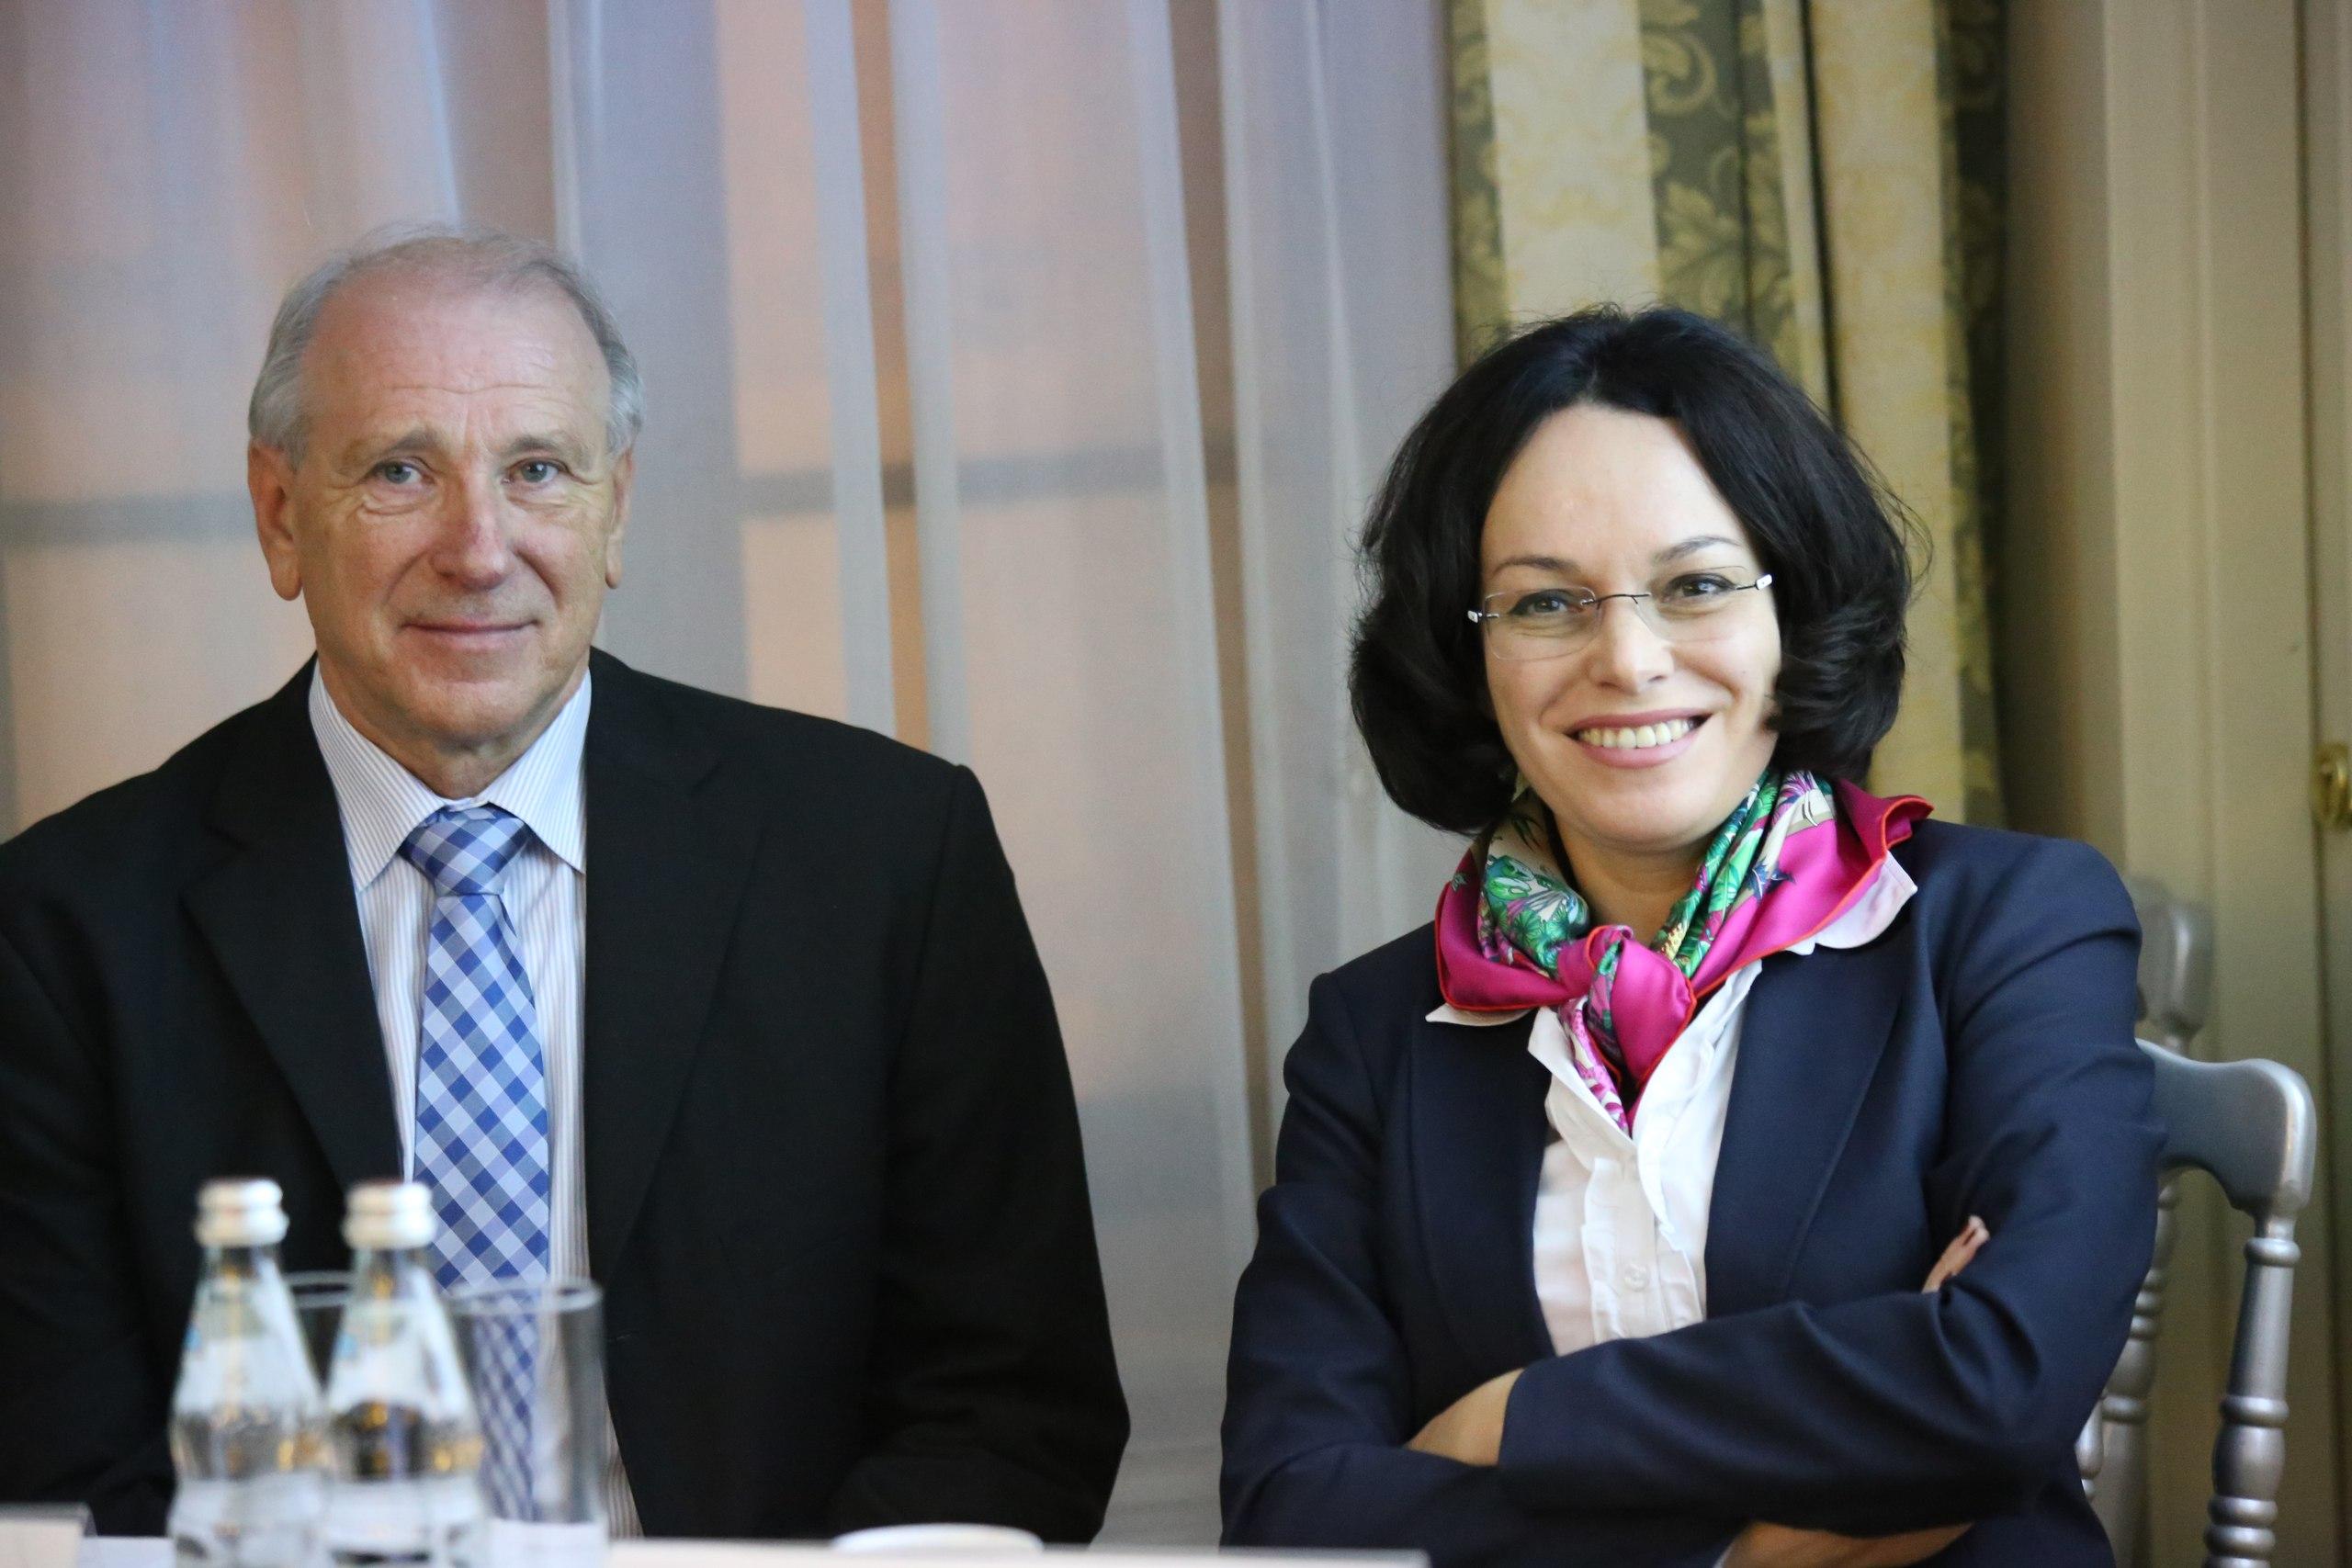 Эрика Эскина (проф., д.м.н.) и Герхард Штендер (бизнес-консультант клиники «Сфера», Gerhard Stenger)